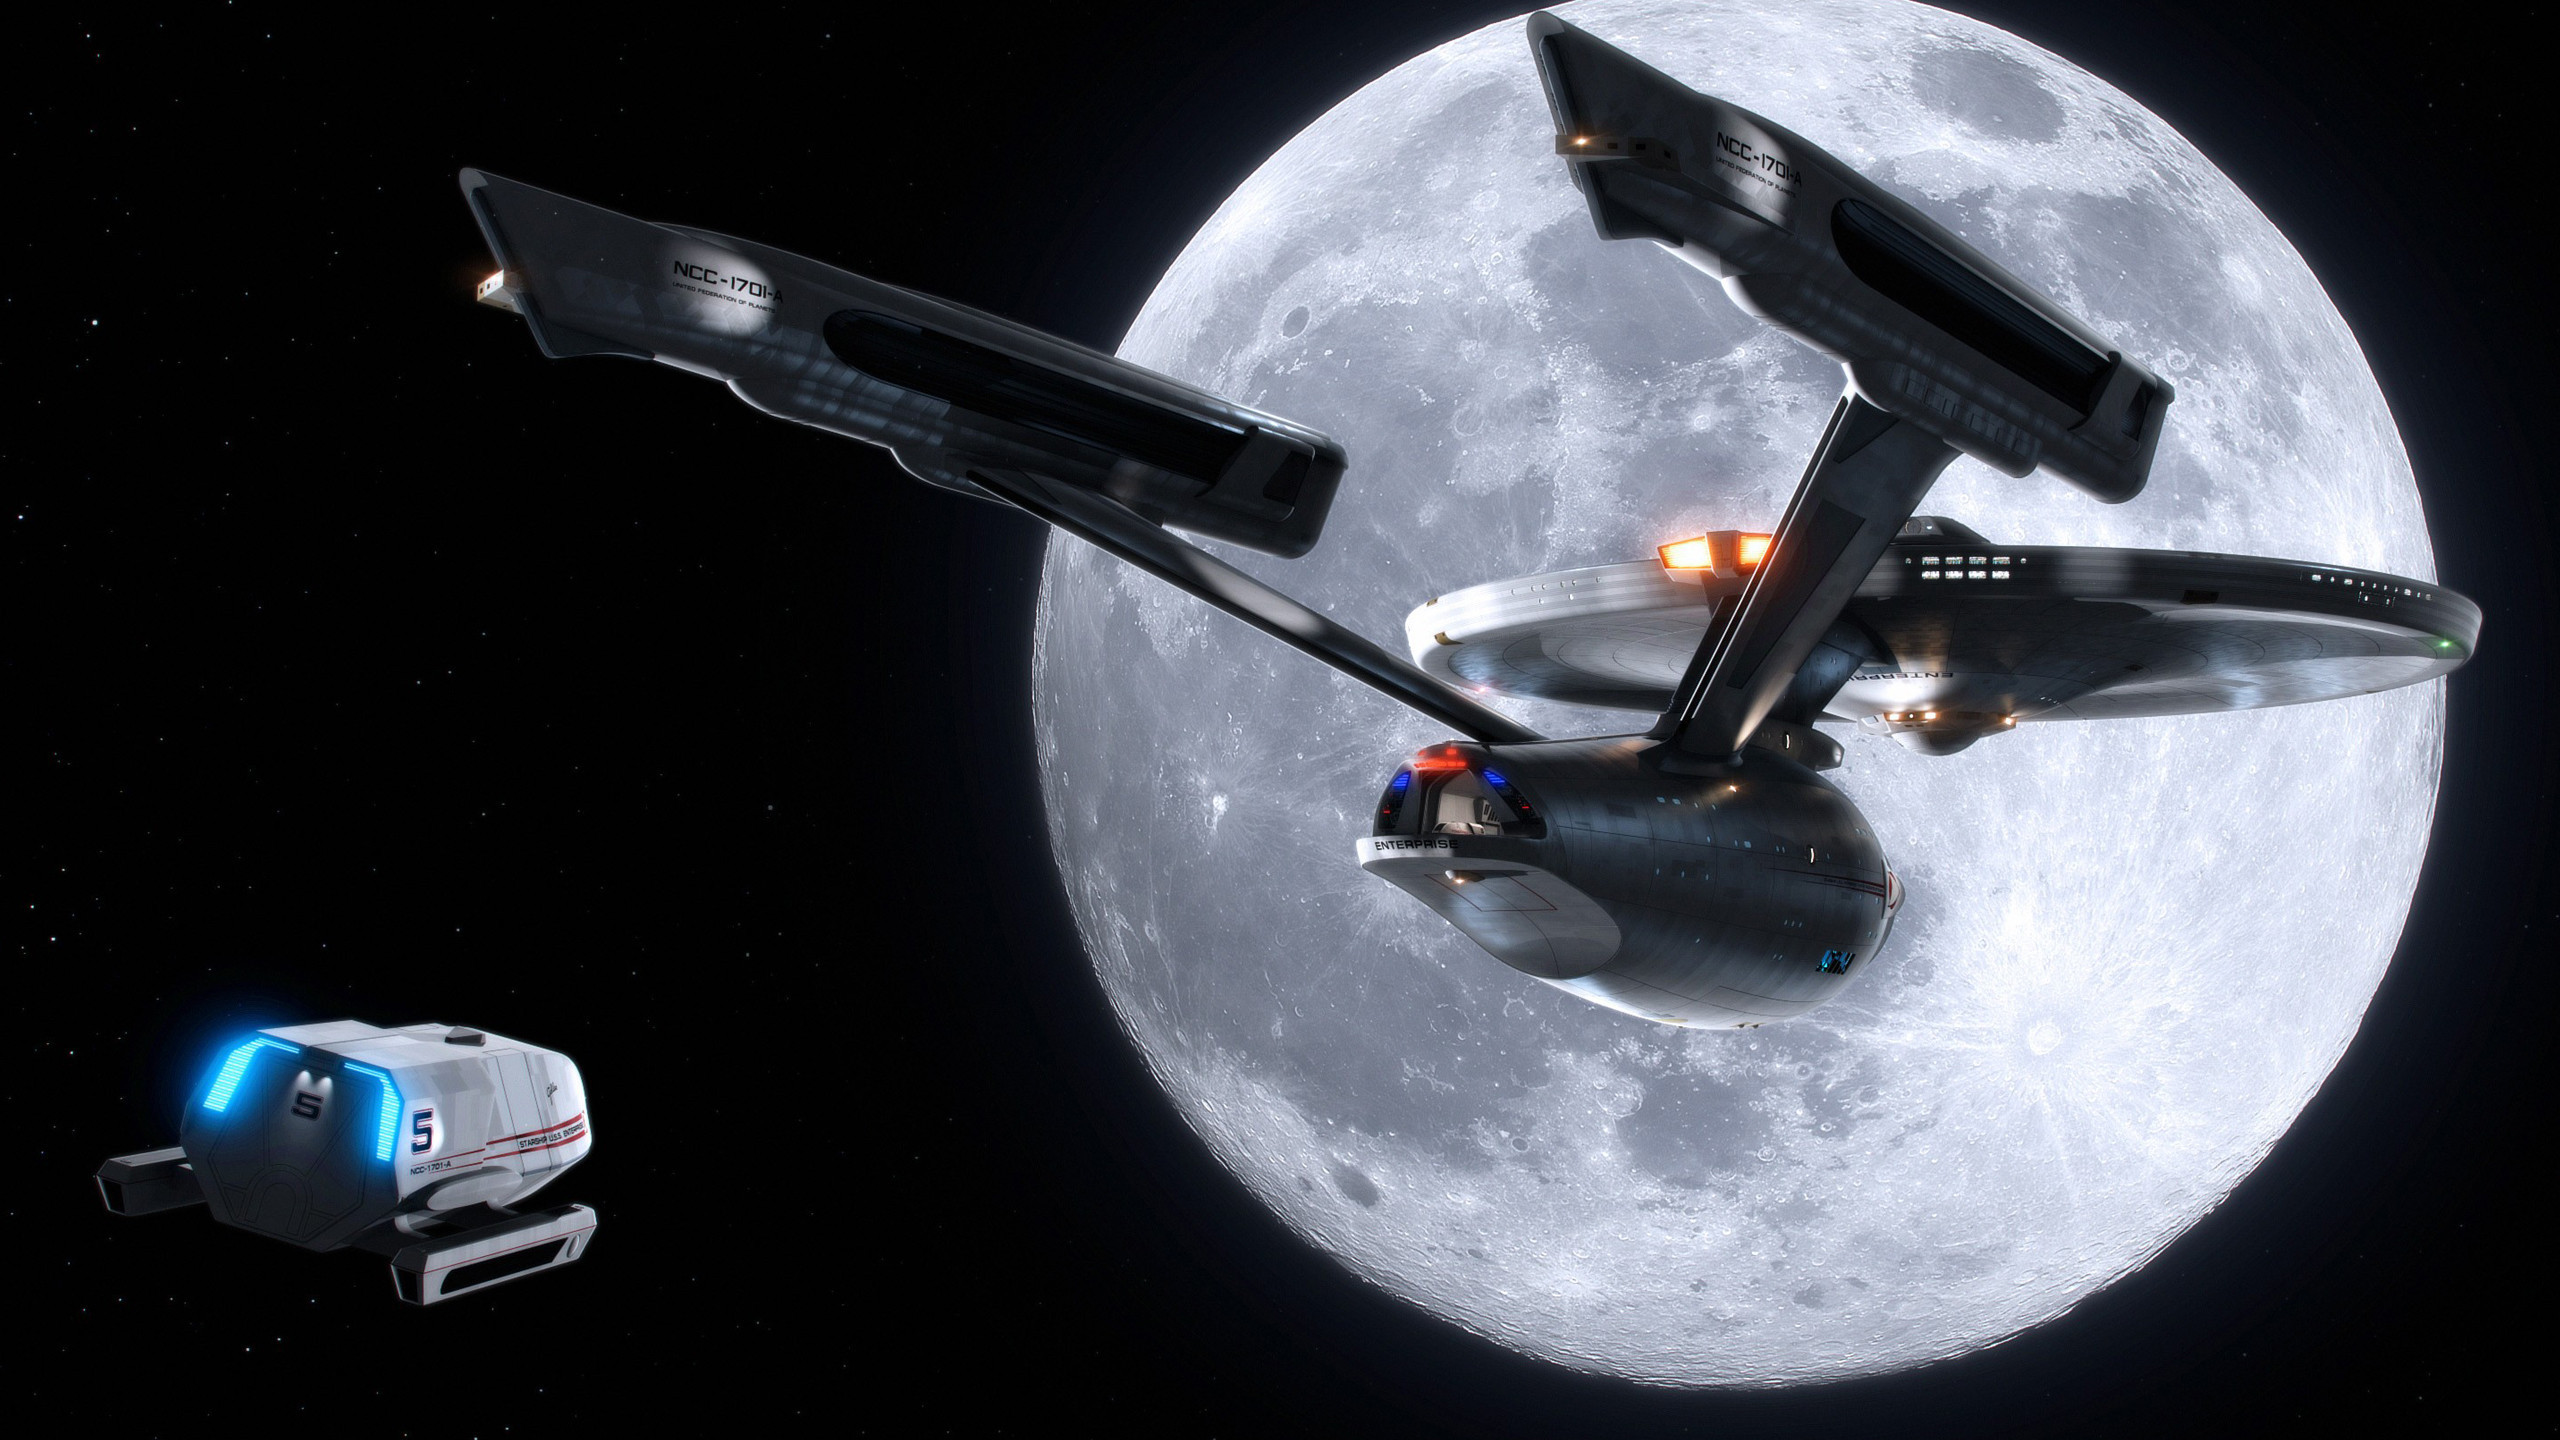 USS Enterprise [2560×1440] (xpost from /r/OtakuVisualArts) …